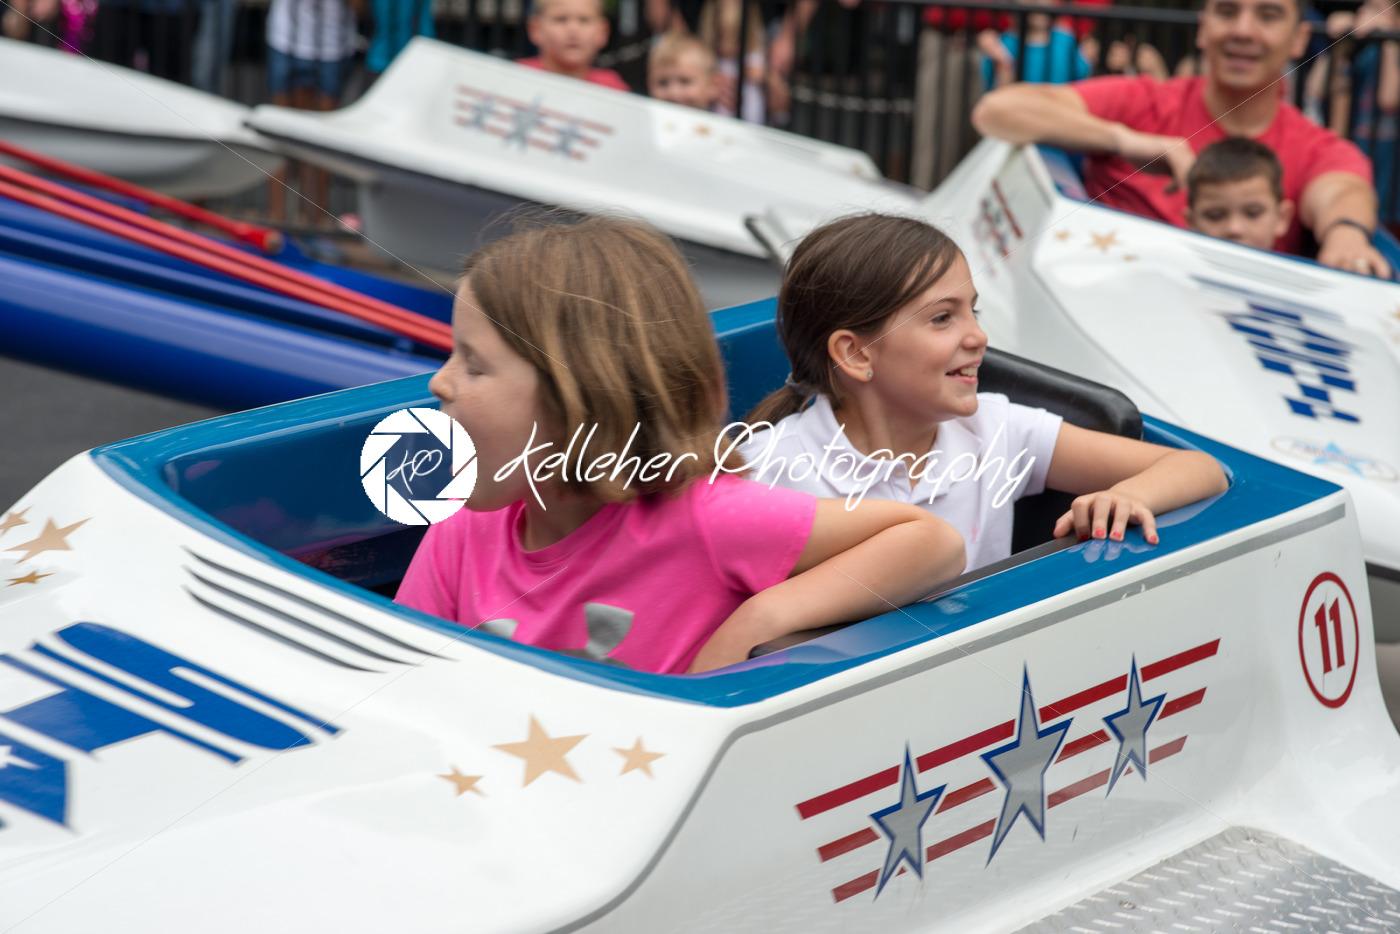 HERSHEY, PA – JUNE 5: AIS Brwonies visit to Hershey Park on June 5, 2017 - Kelleher Photography Store